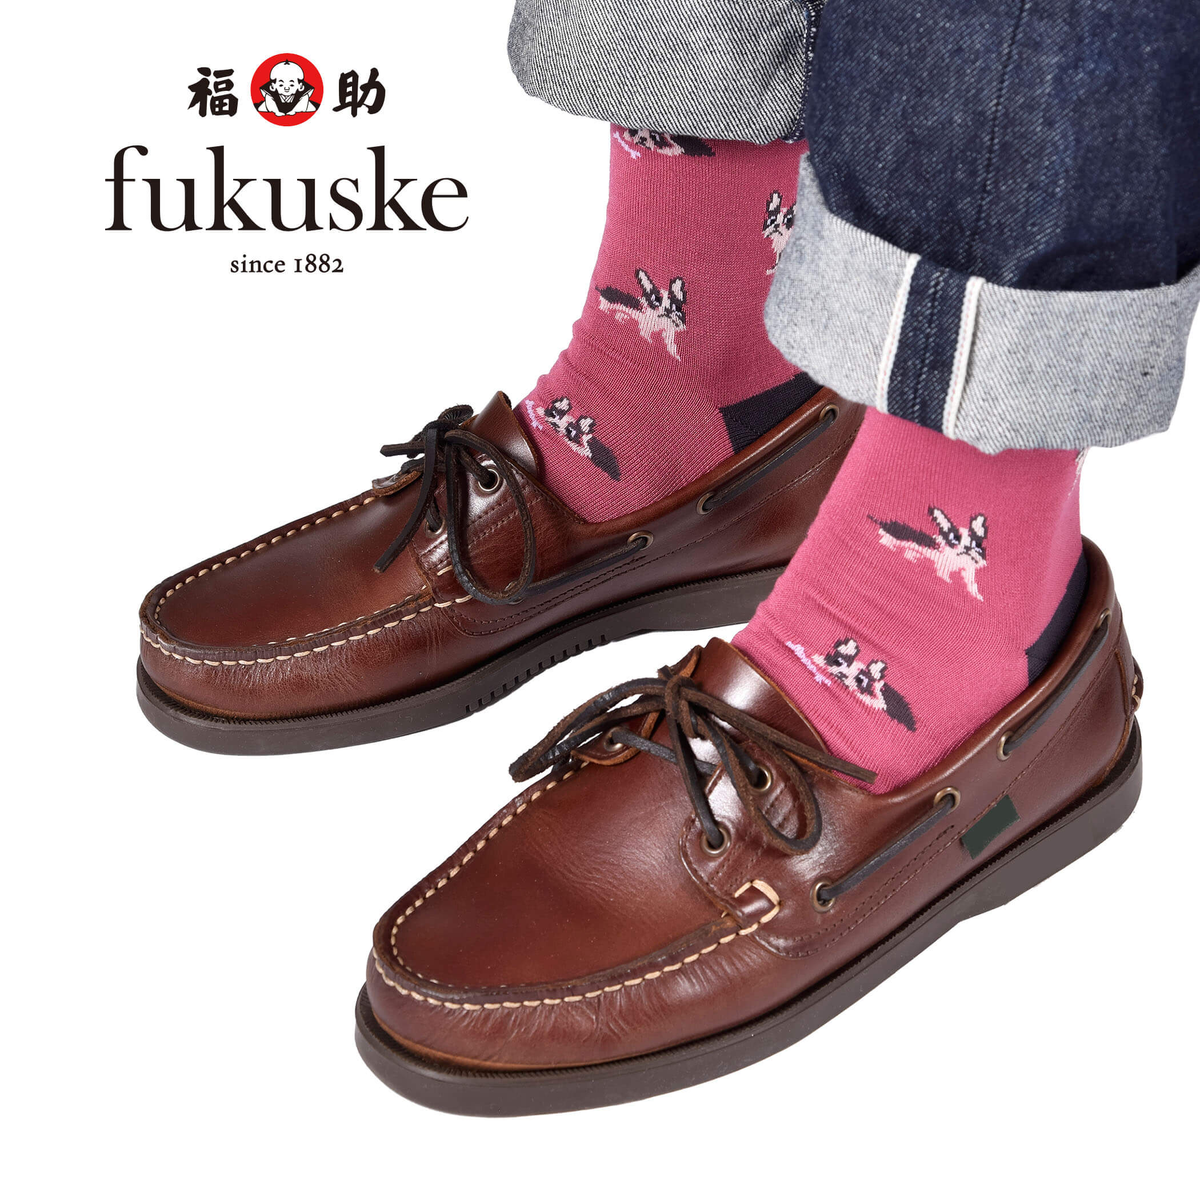 fukuske パイル アメリブ 足袋型 クルー丈 ソックス